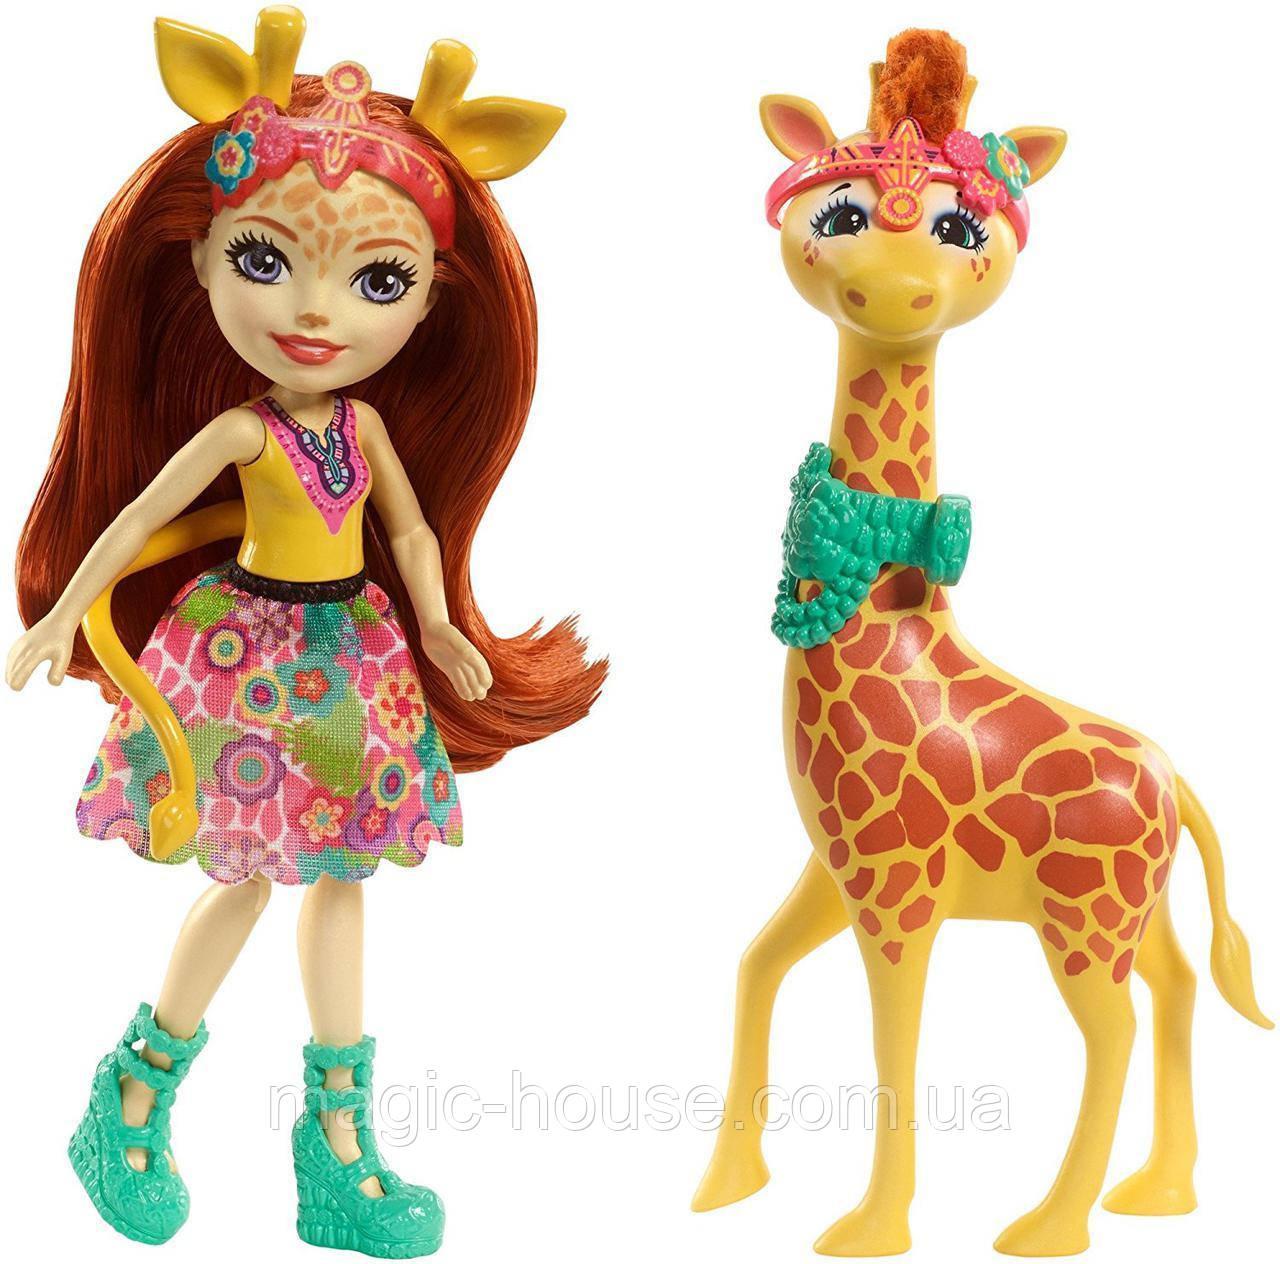 Кукла Энчантималс Жираф Джиллиан и друг Повл Enchantimals Gillian Giraffe s Fashion Dolls